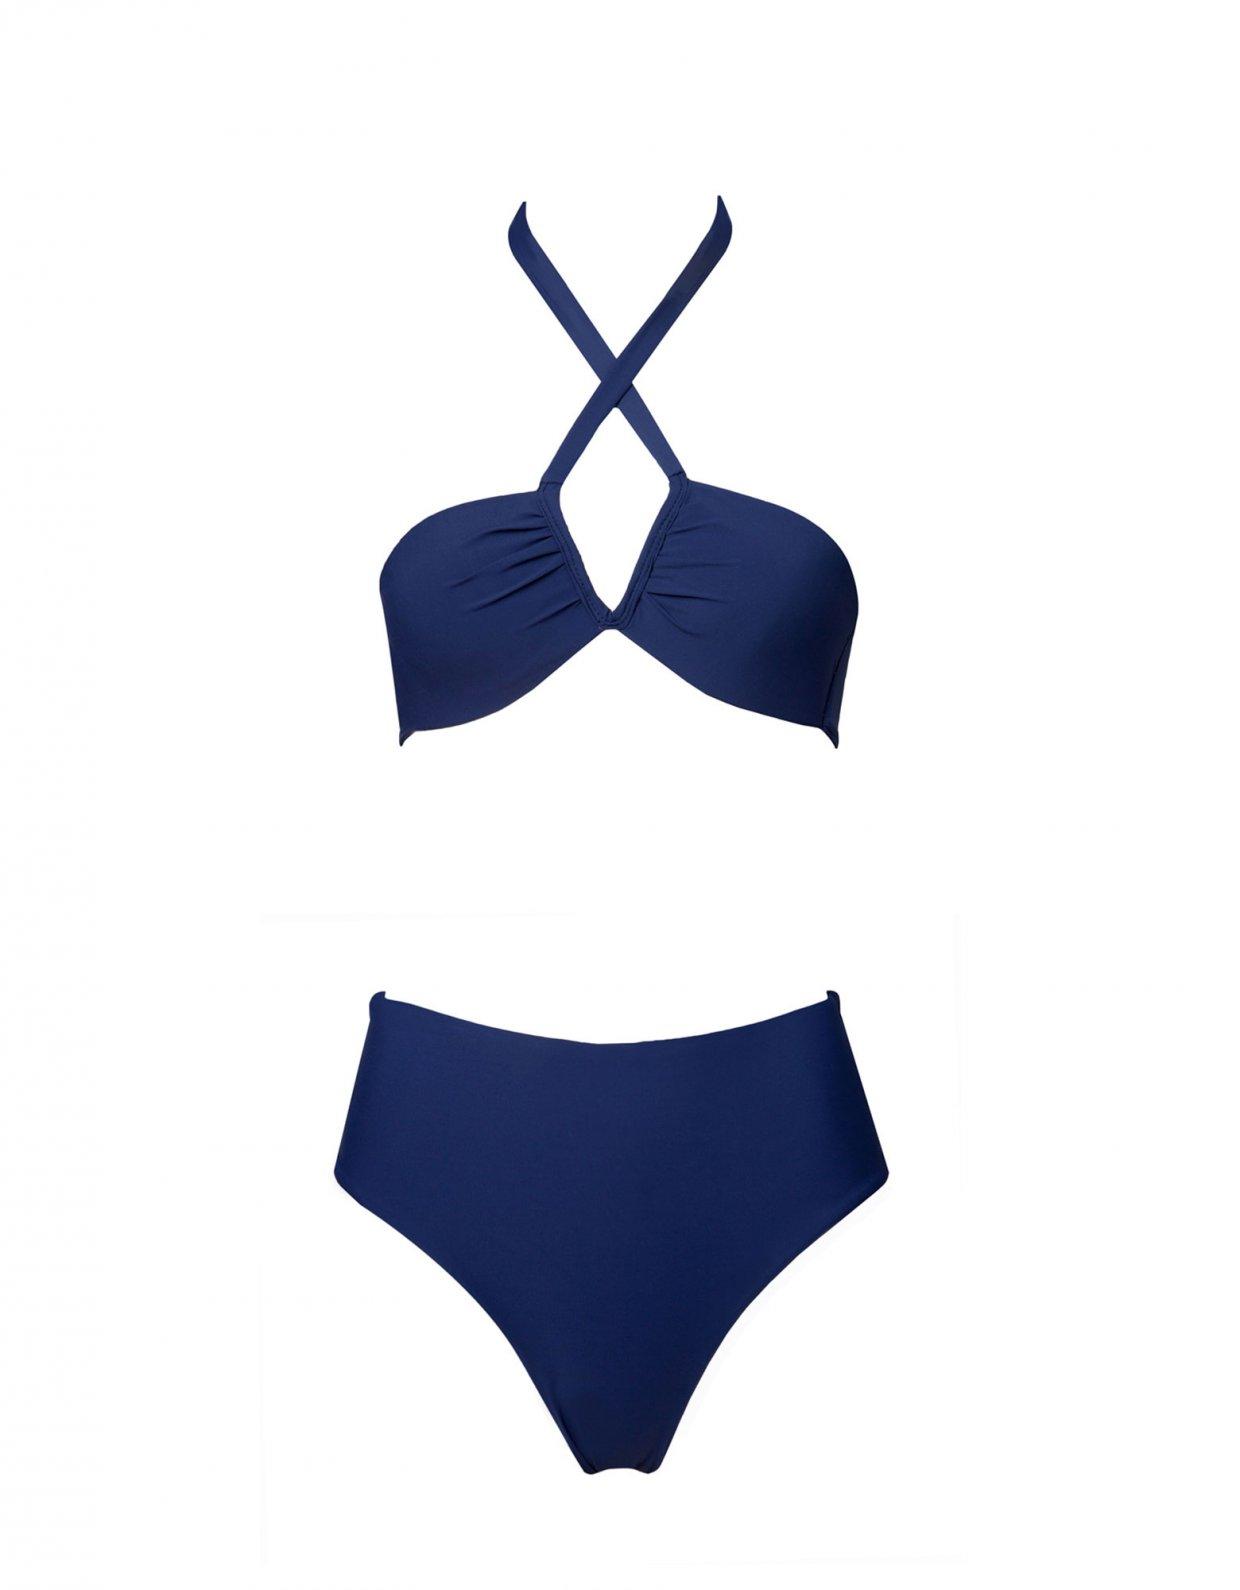 Lookseri swimwear Celina bikini patriot blue